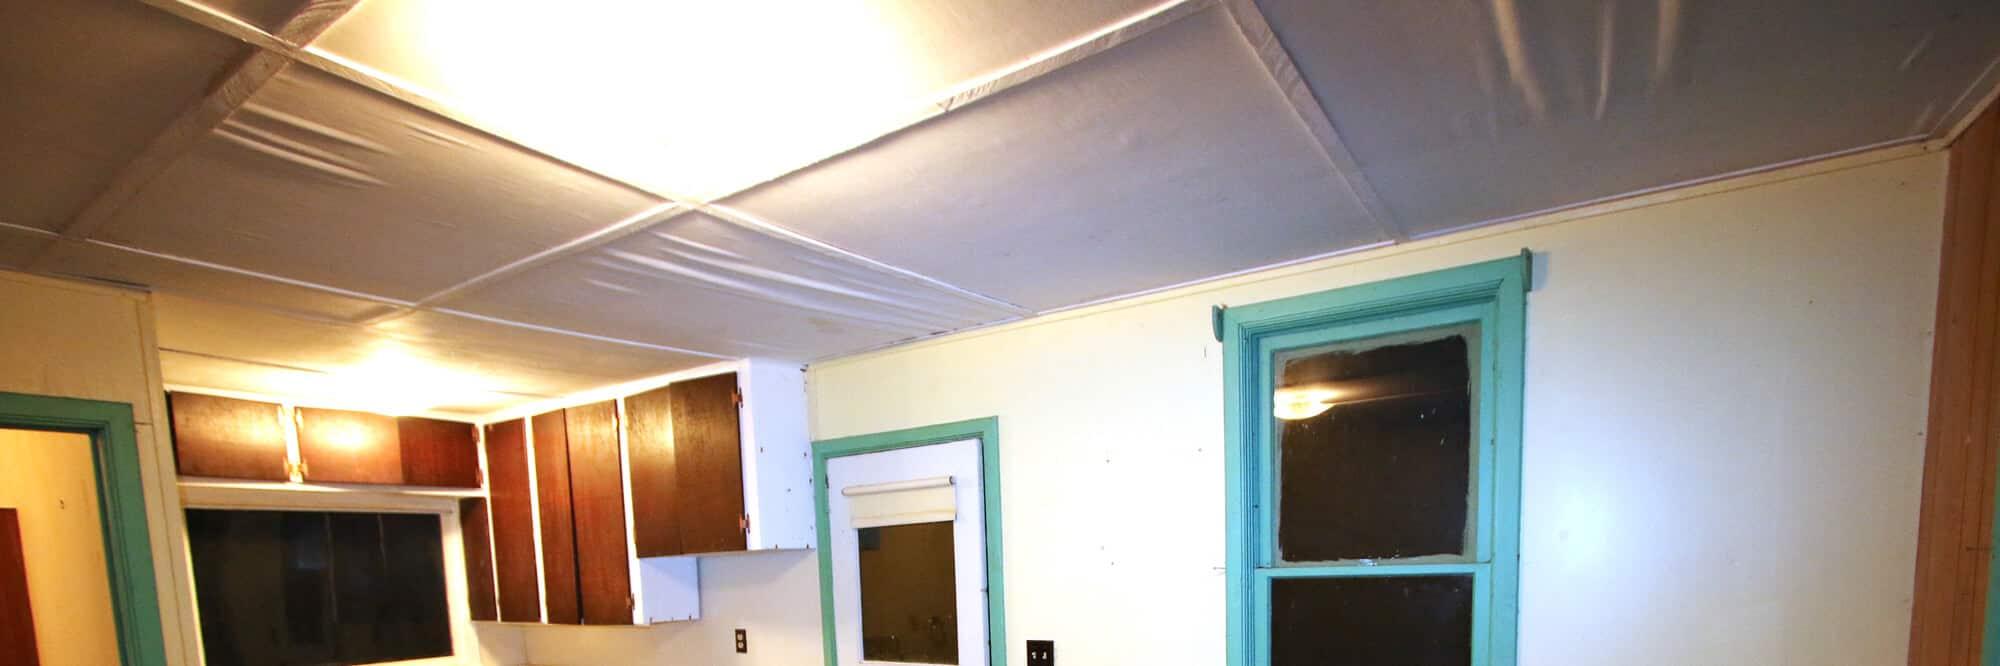 Micro-Unit-Renovation-13-cropped